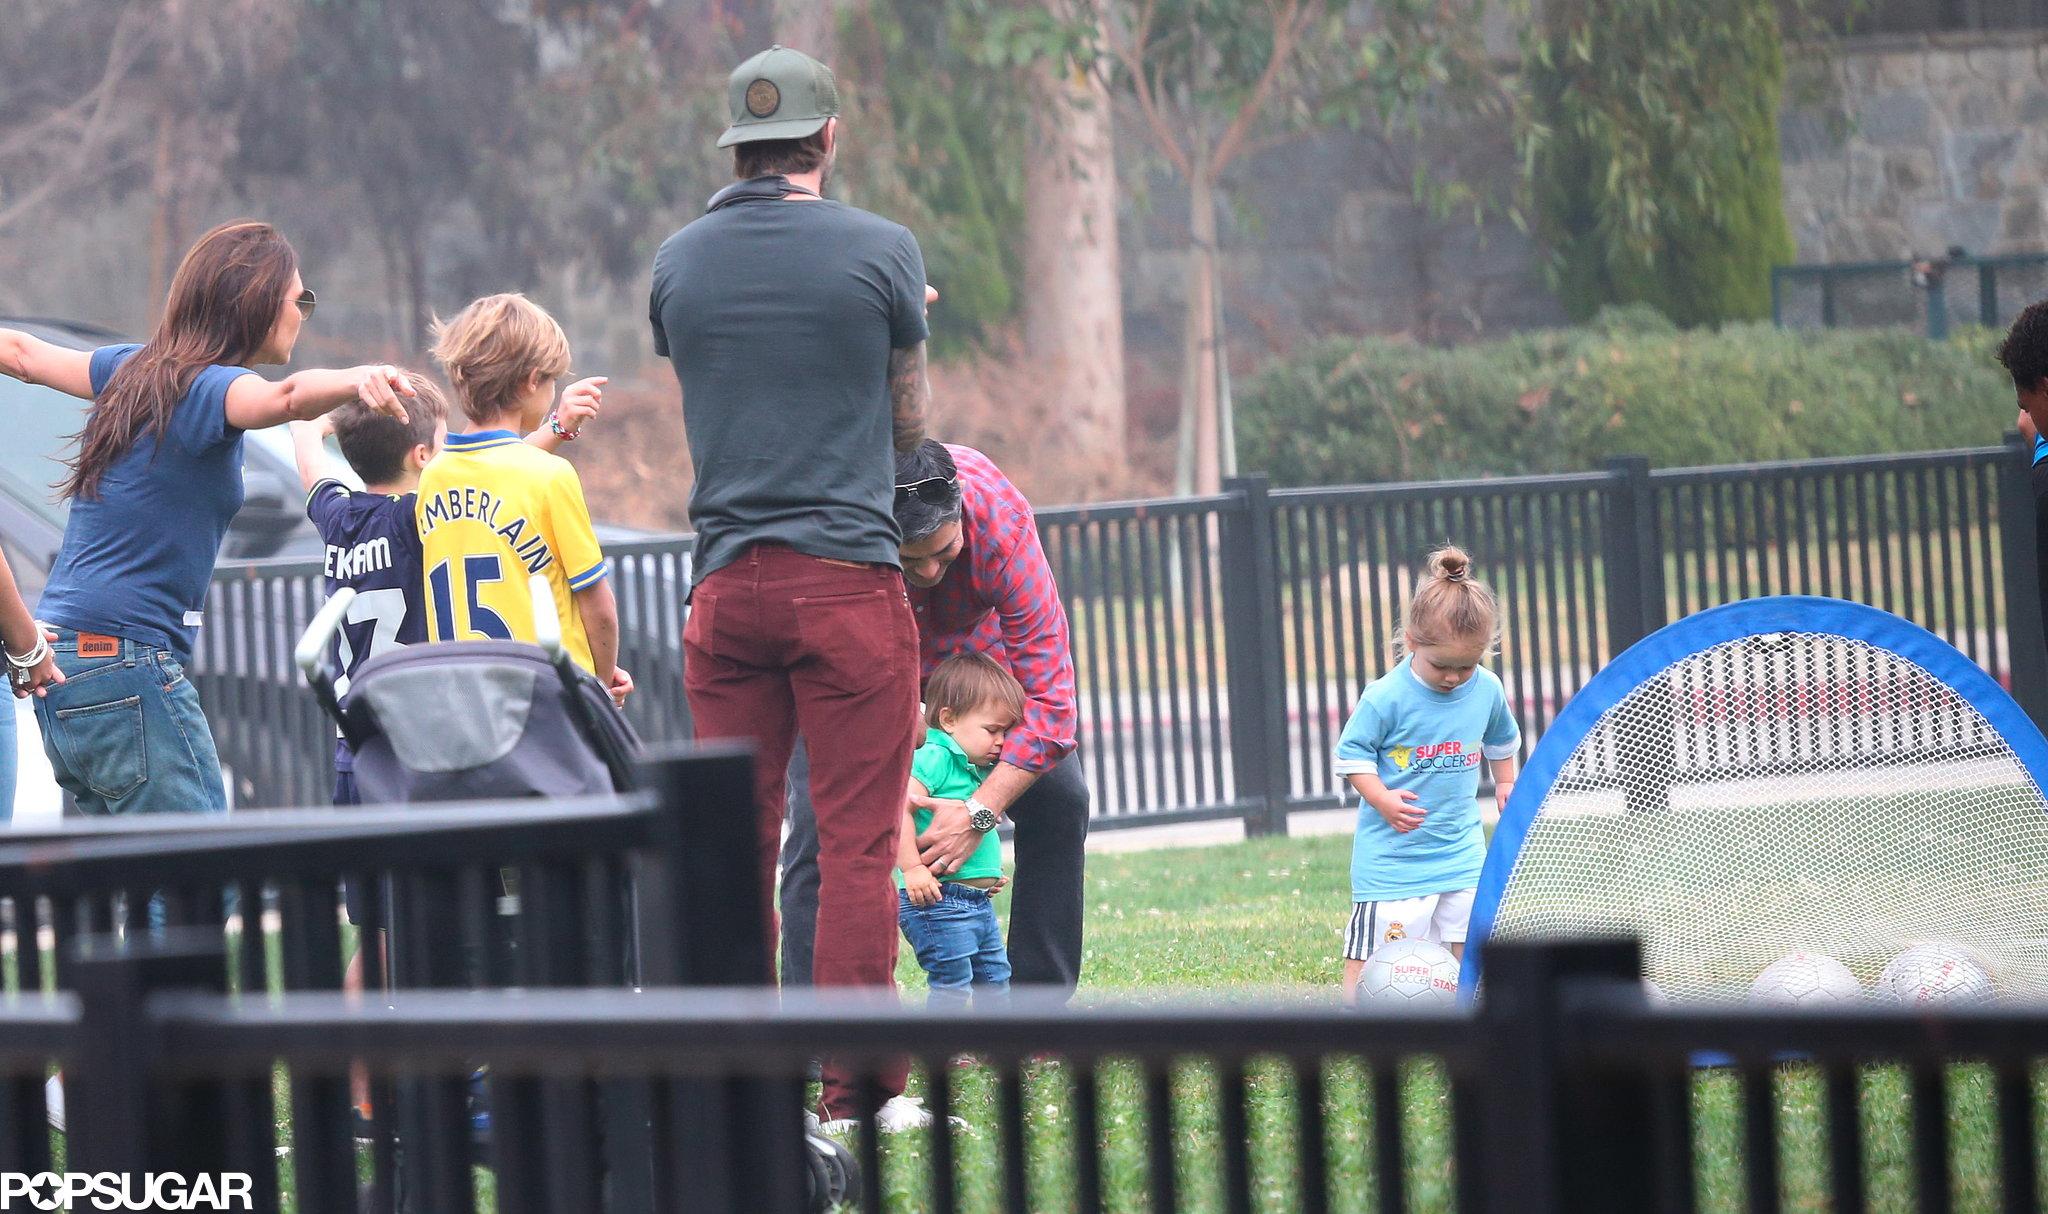 David Beckham and Victoria Beckham watched their daughter, Harper, play soccer.